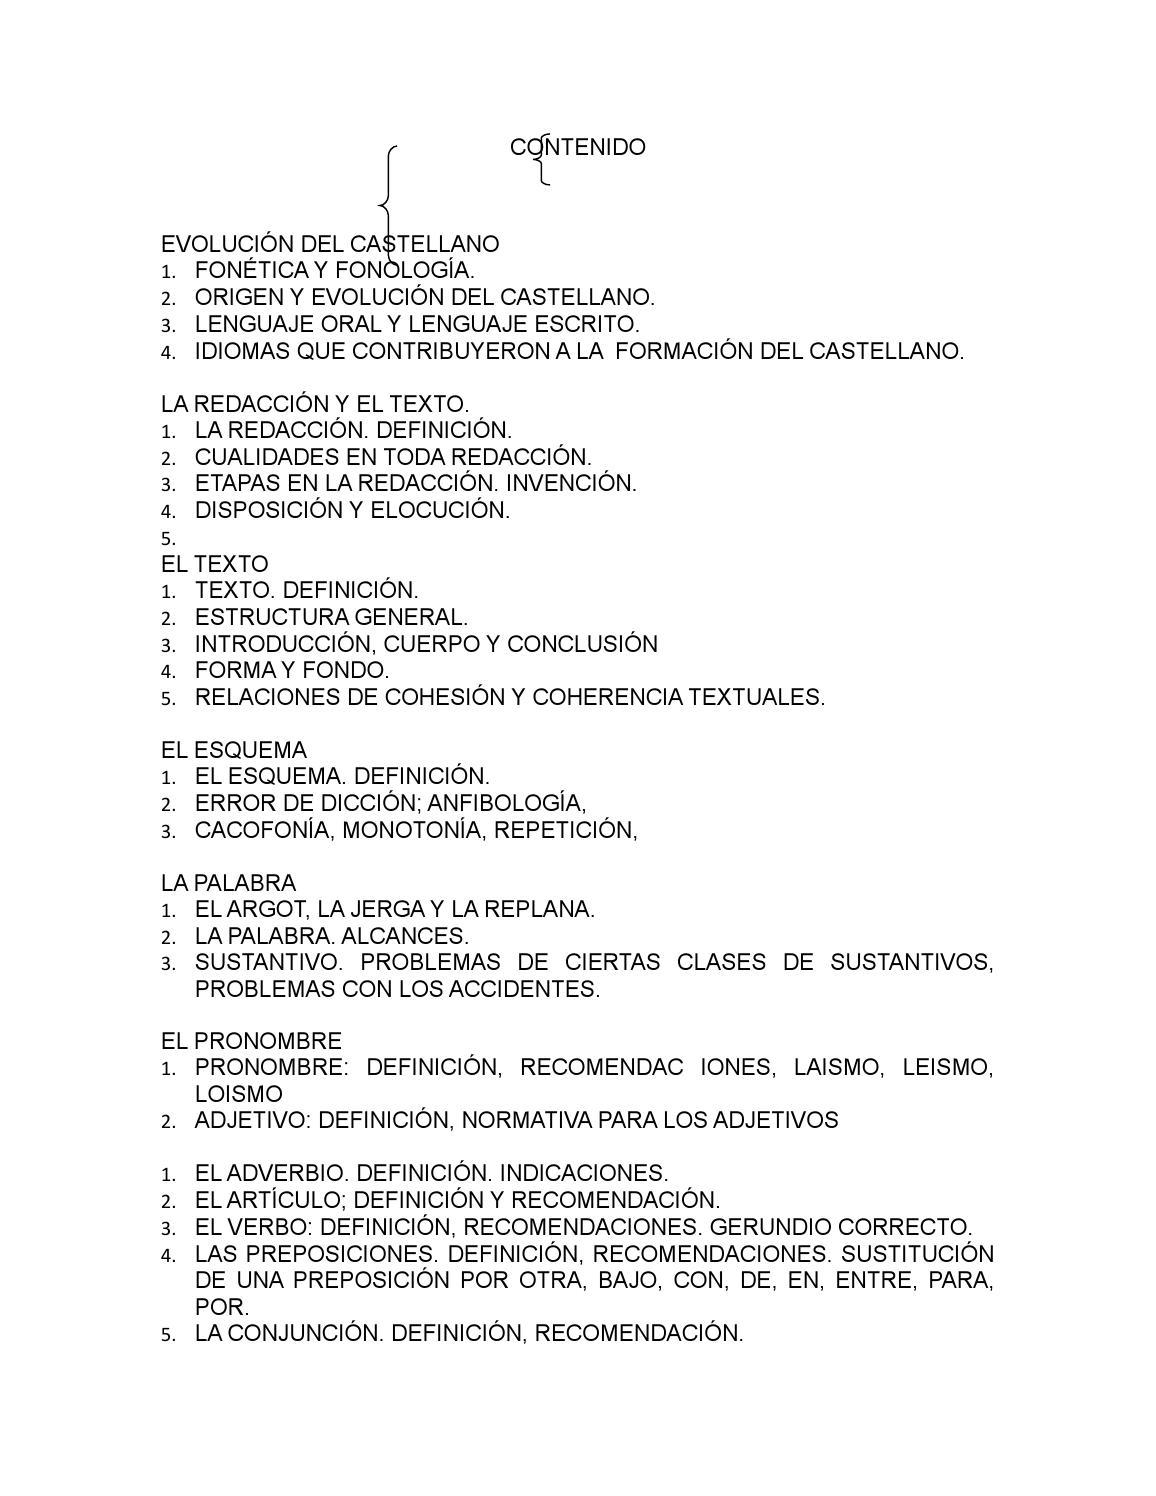 Evoluci n del castellano by mercedes more issuu for Significado de la palabra arbol